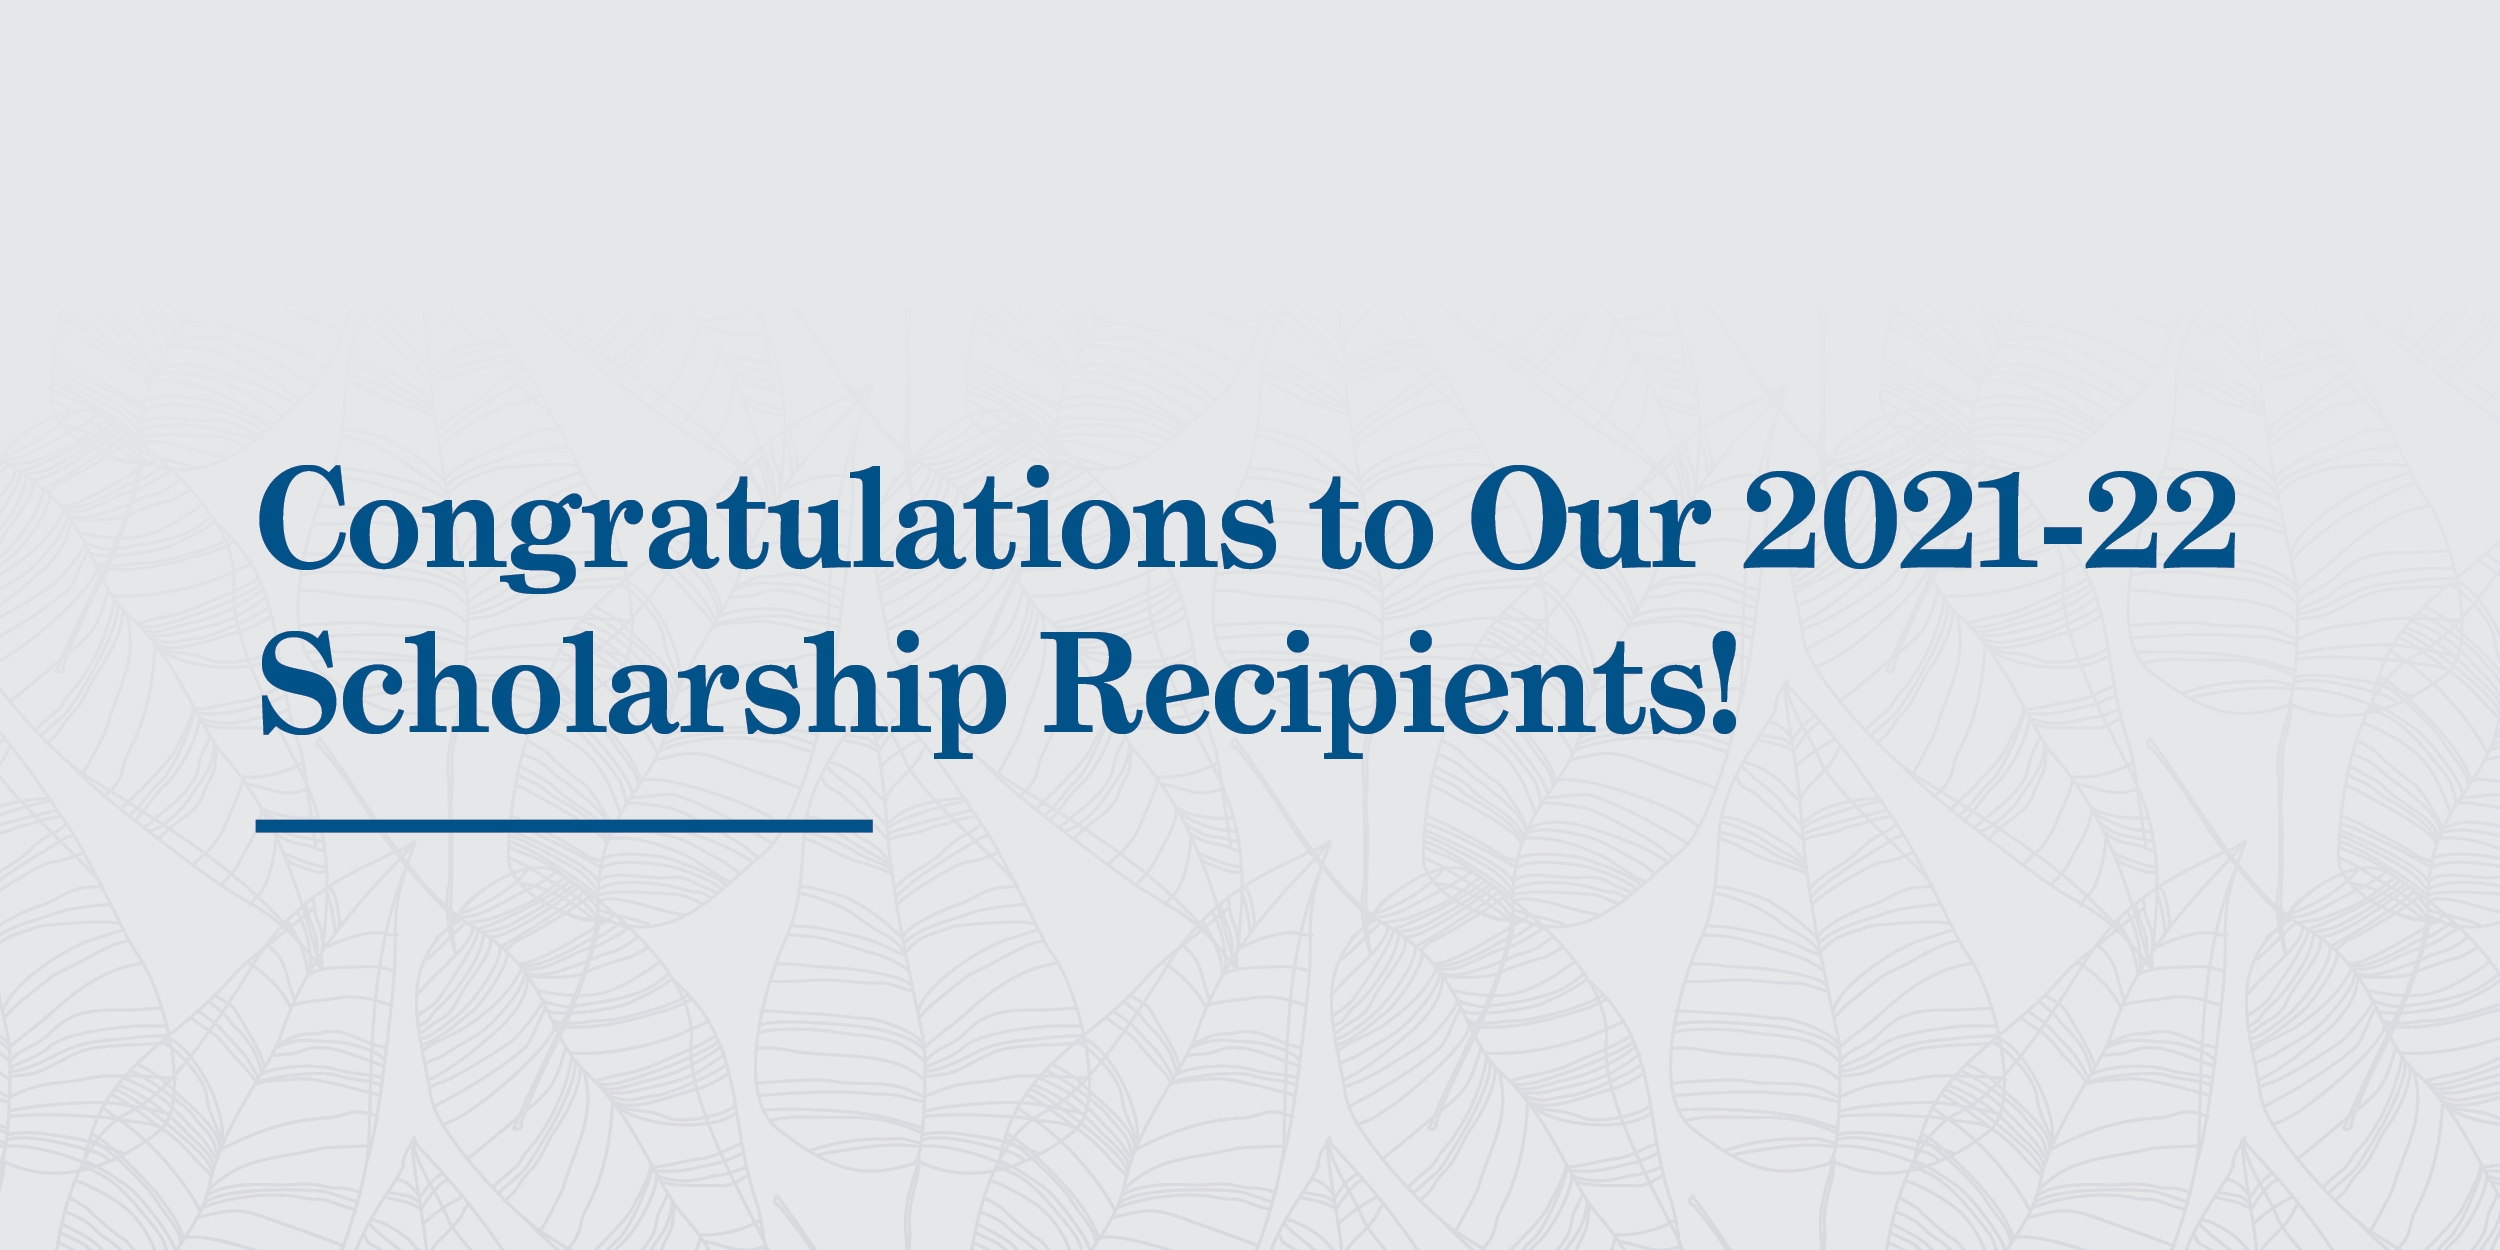 Congratulations to Our 2021-22 Scholarship Recipients!